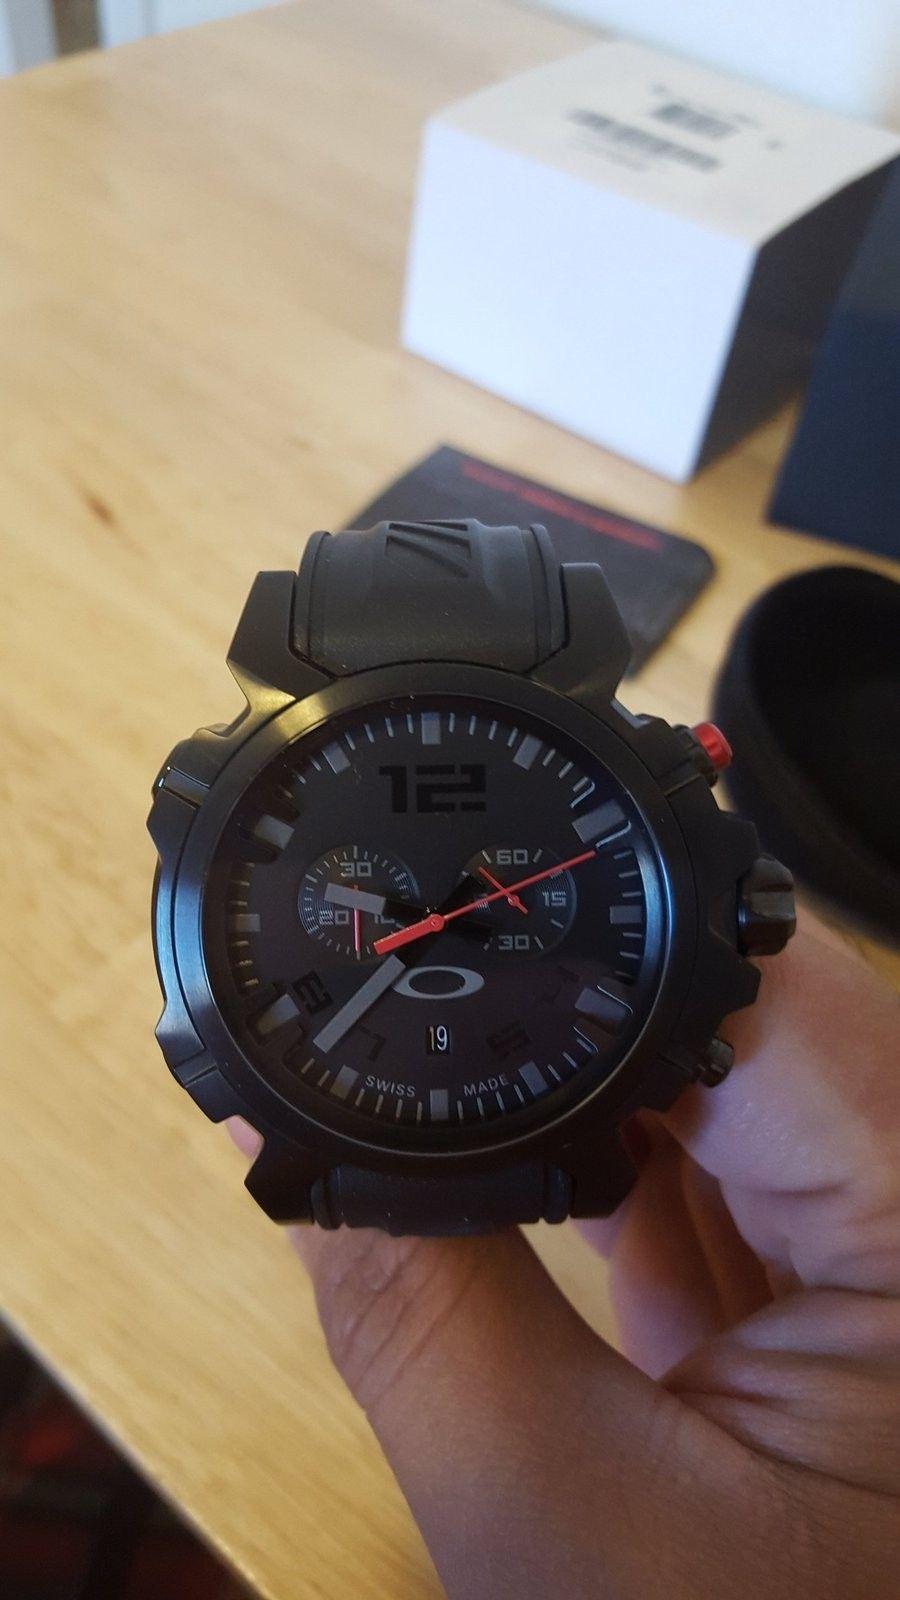 LNIB Stealth Double Tap Watch - 20151219_093658.jpg